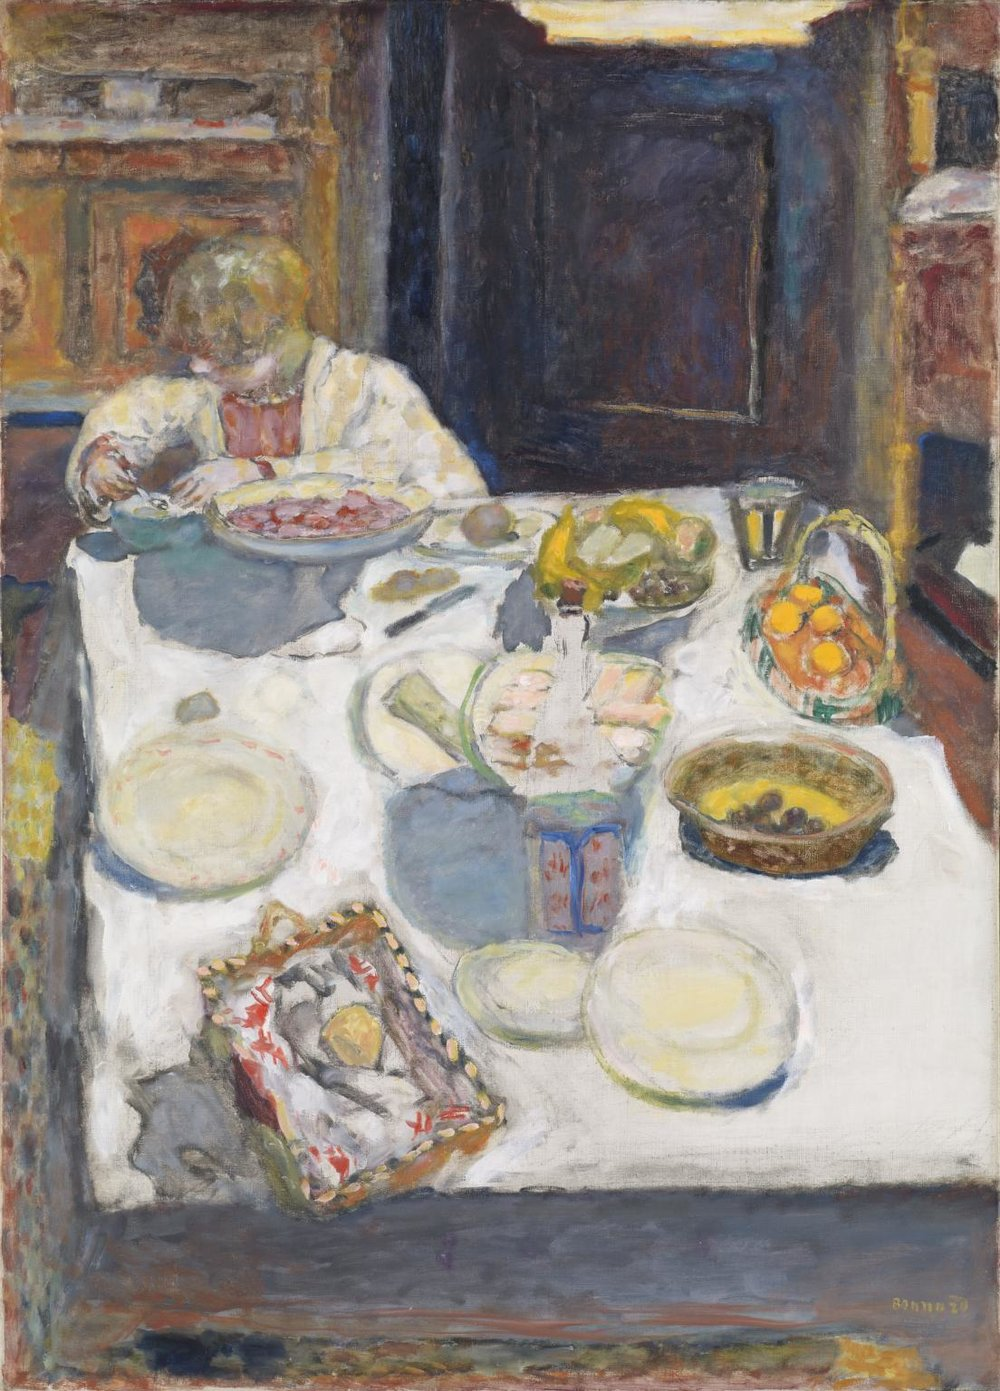 Pierre Bonnard,  The Table,  1925, oil on canvas